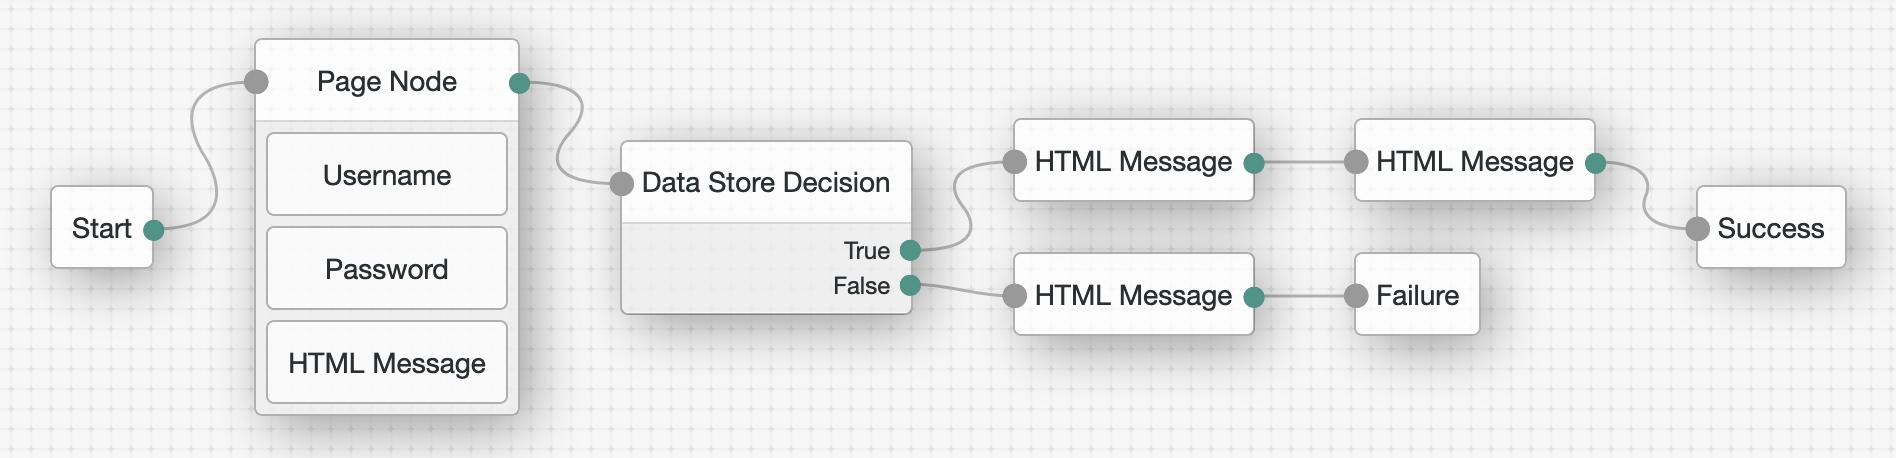 ScreenShot of a sample tree